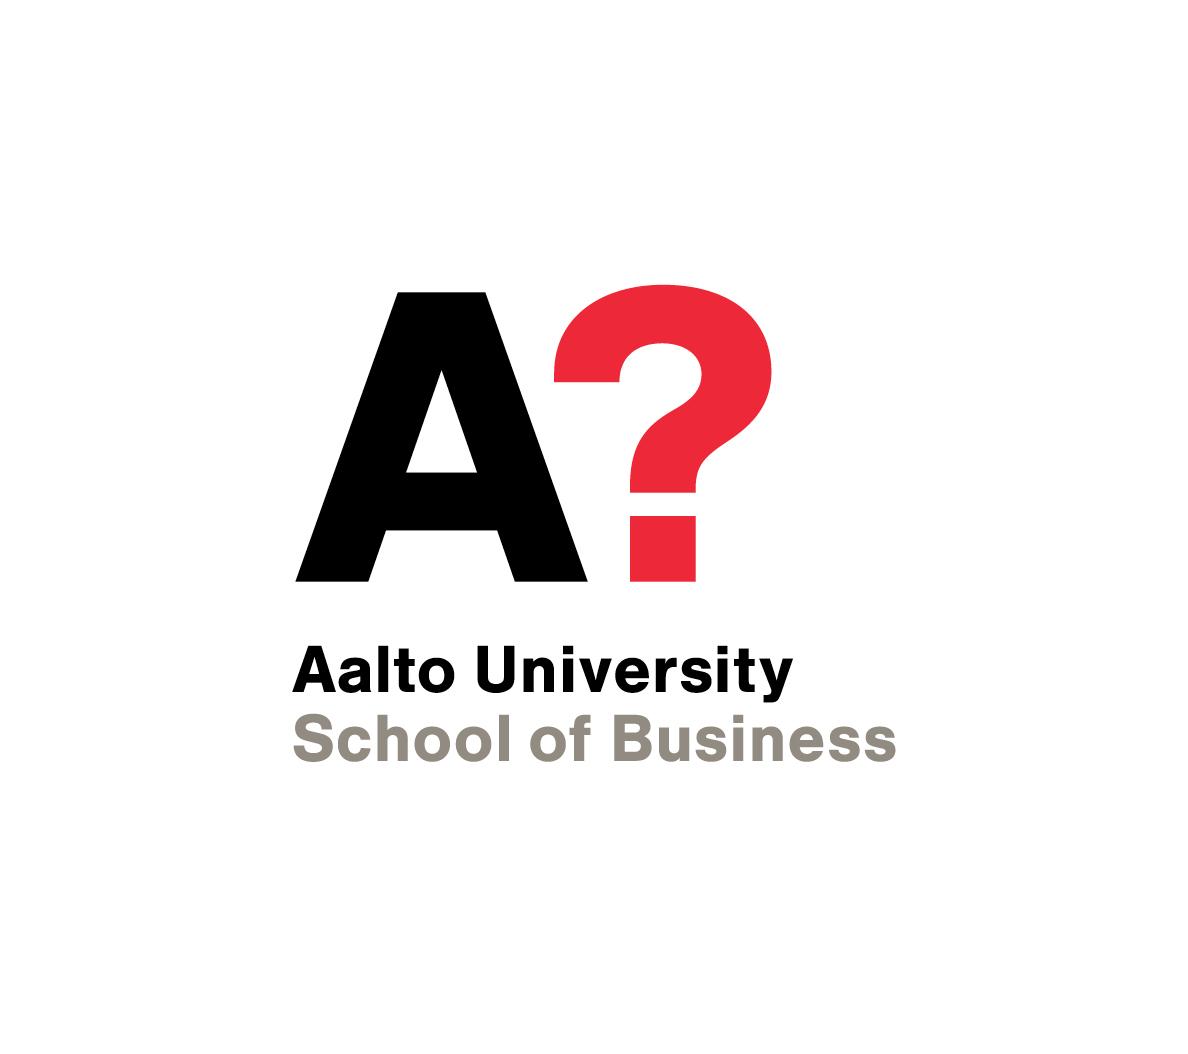 Aalto_University_School_of_Economics.jpg